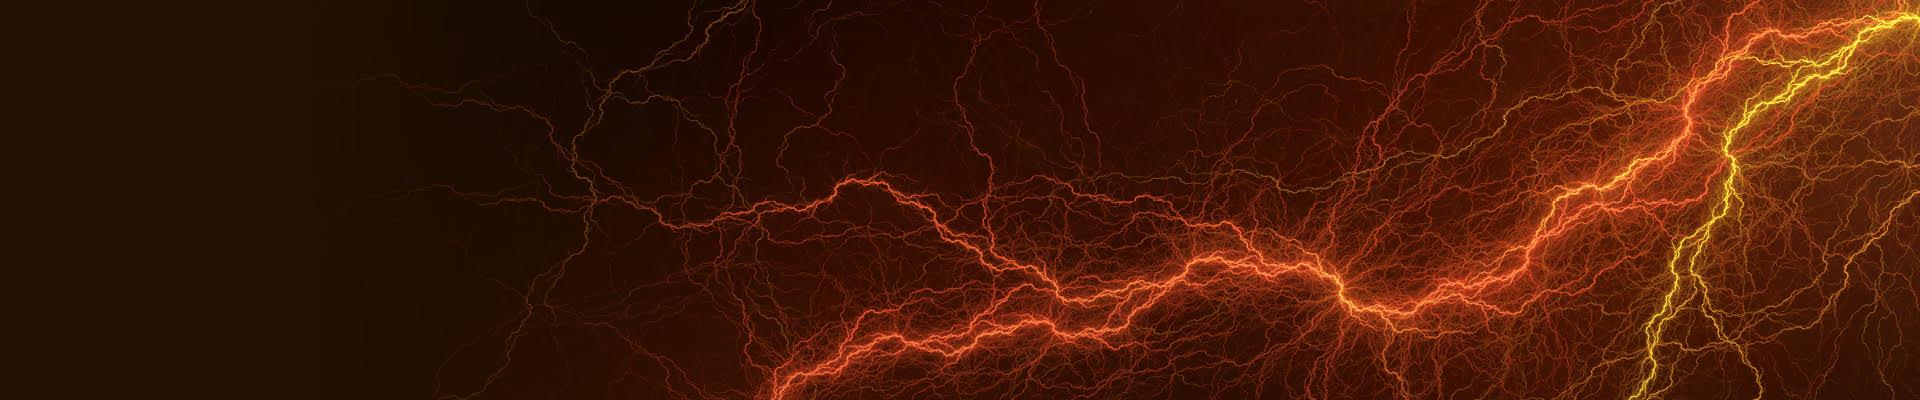 Technyl® ORANGE Electrical Safety Polymers